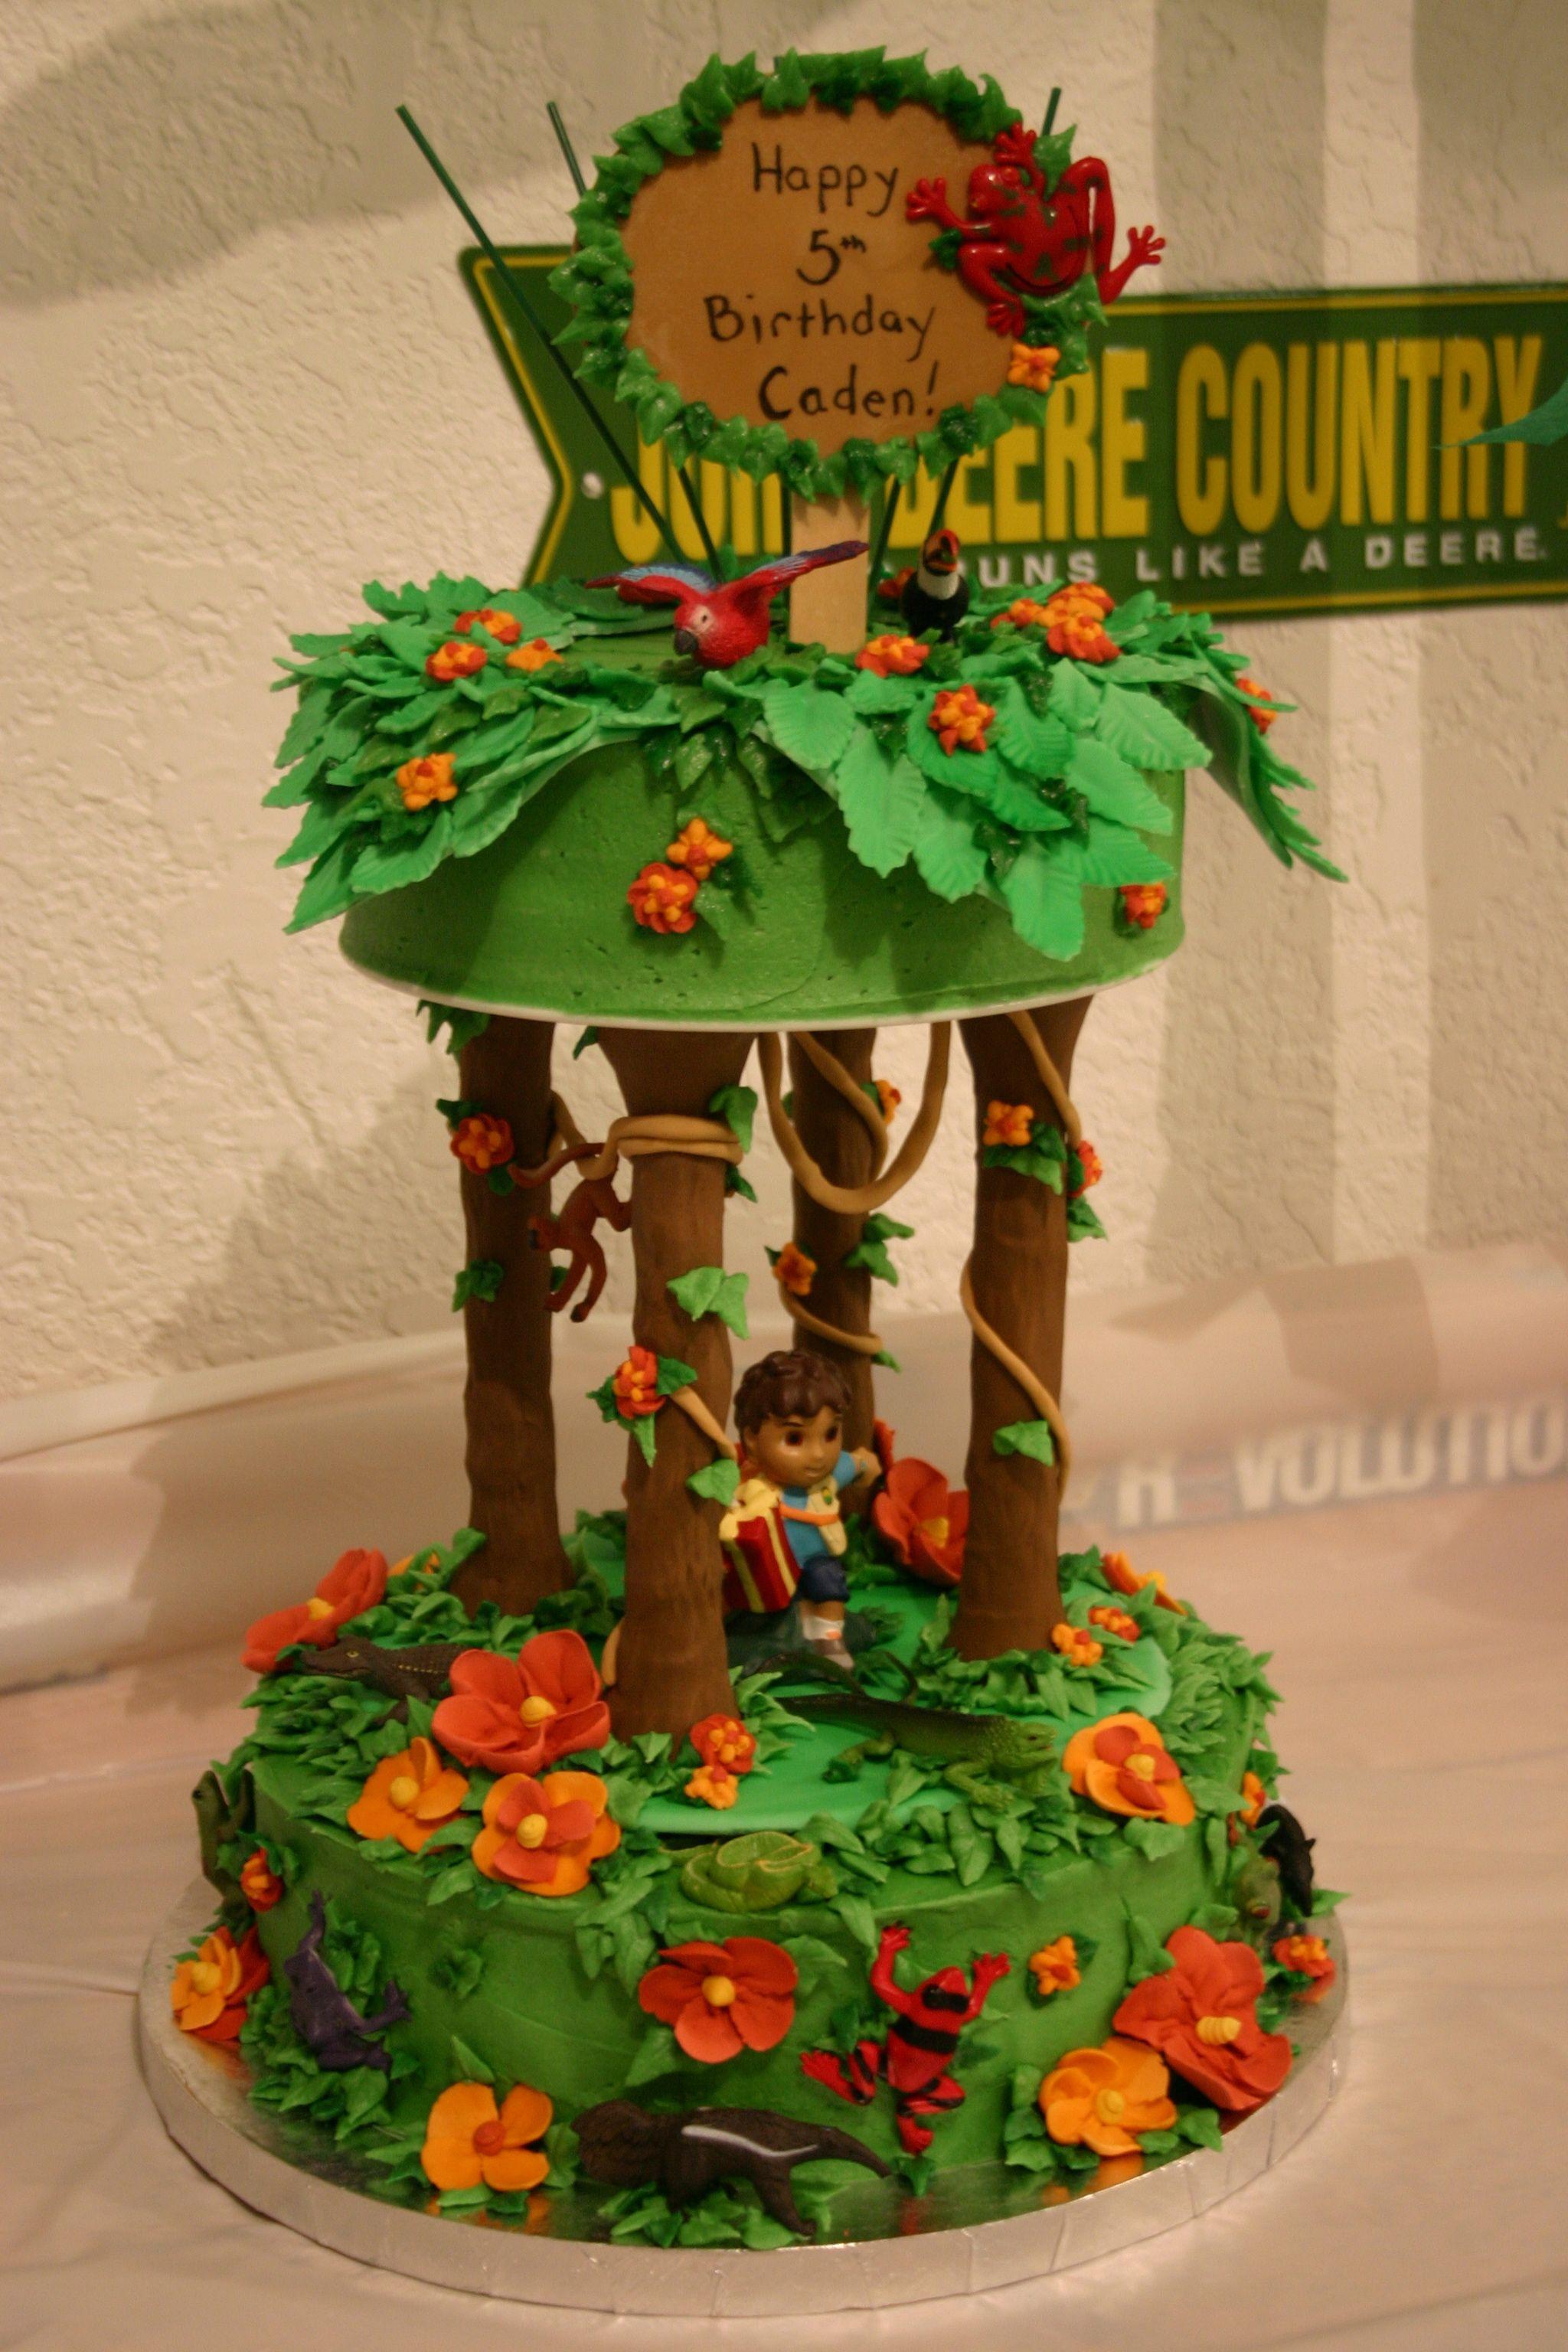 Cake Tiered Rainforestgo With Animals